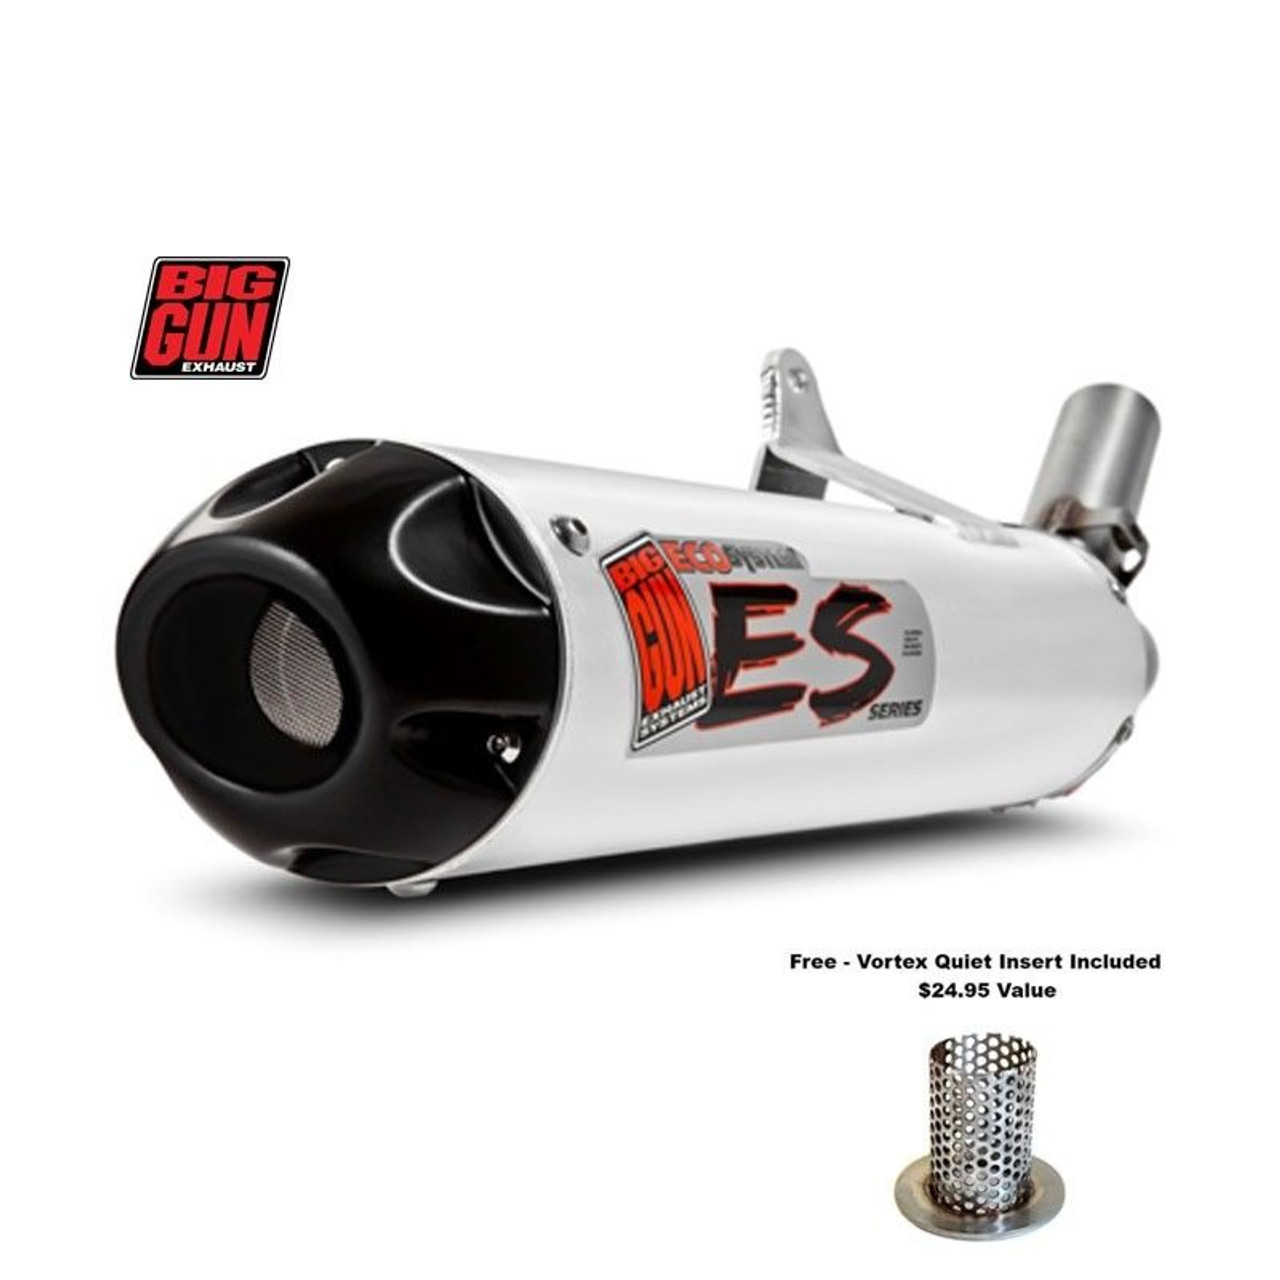 Vortex Quiet Insert Big Gun Exhaust Pipe Muffler Atv 41-E0053